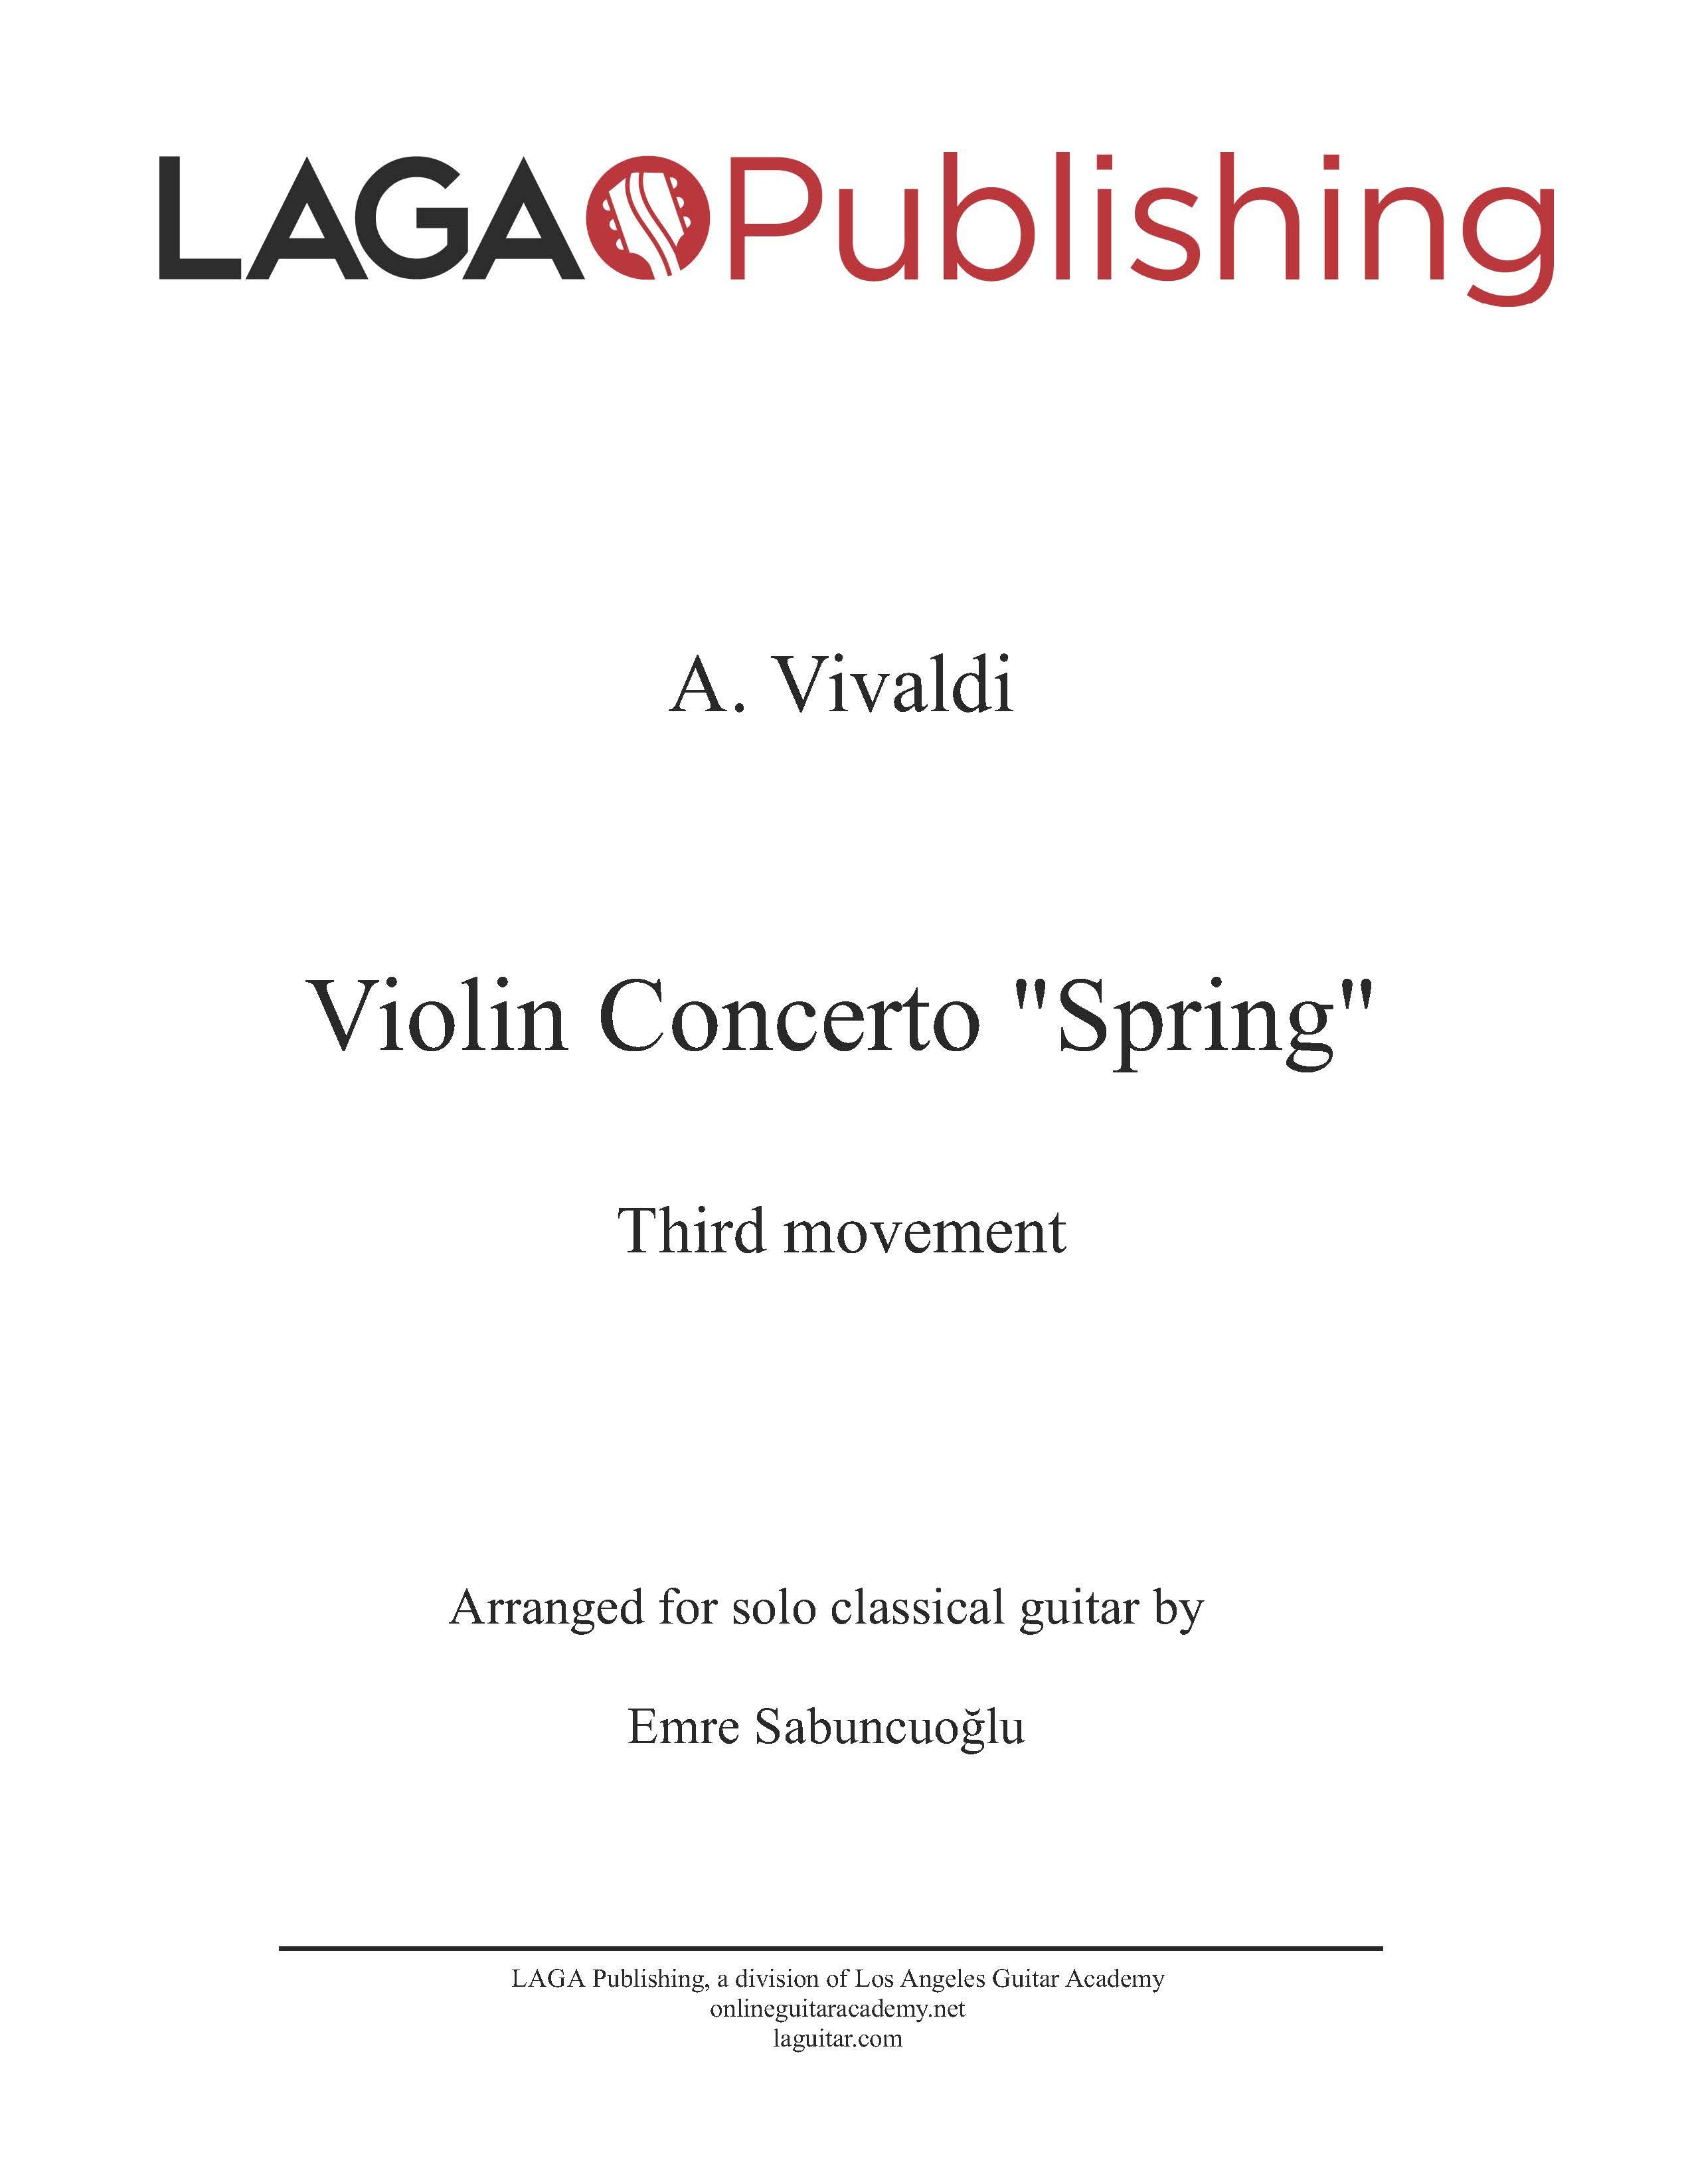 LAGA-Publishing-Vivaldi-4Seasons-Spring-III